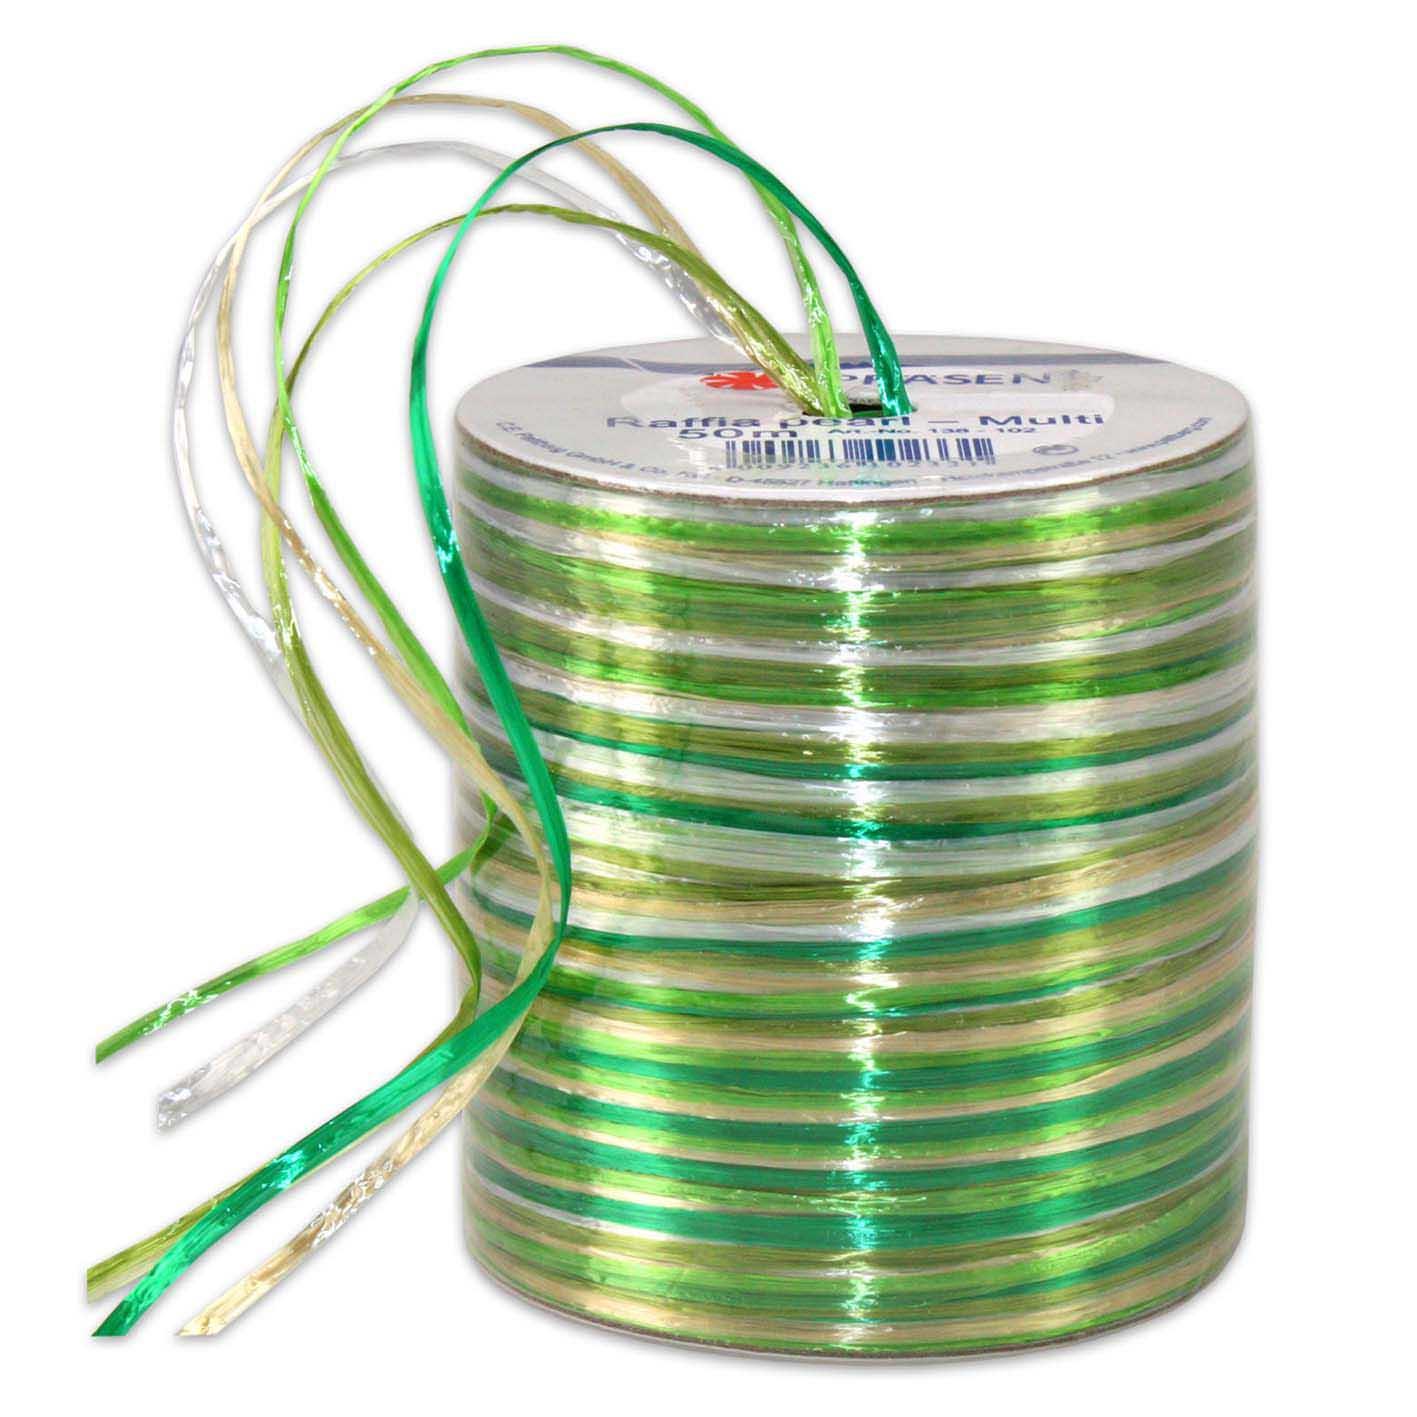 Bolduc raphia multicolore 5 couleurs - 50 m - bobine n°30 (photo)